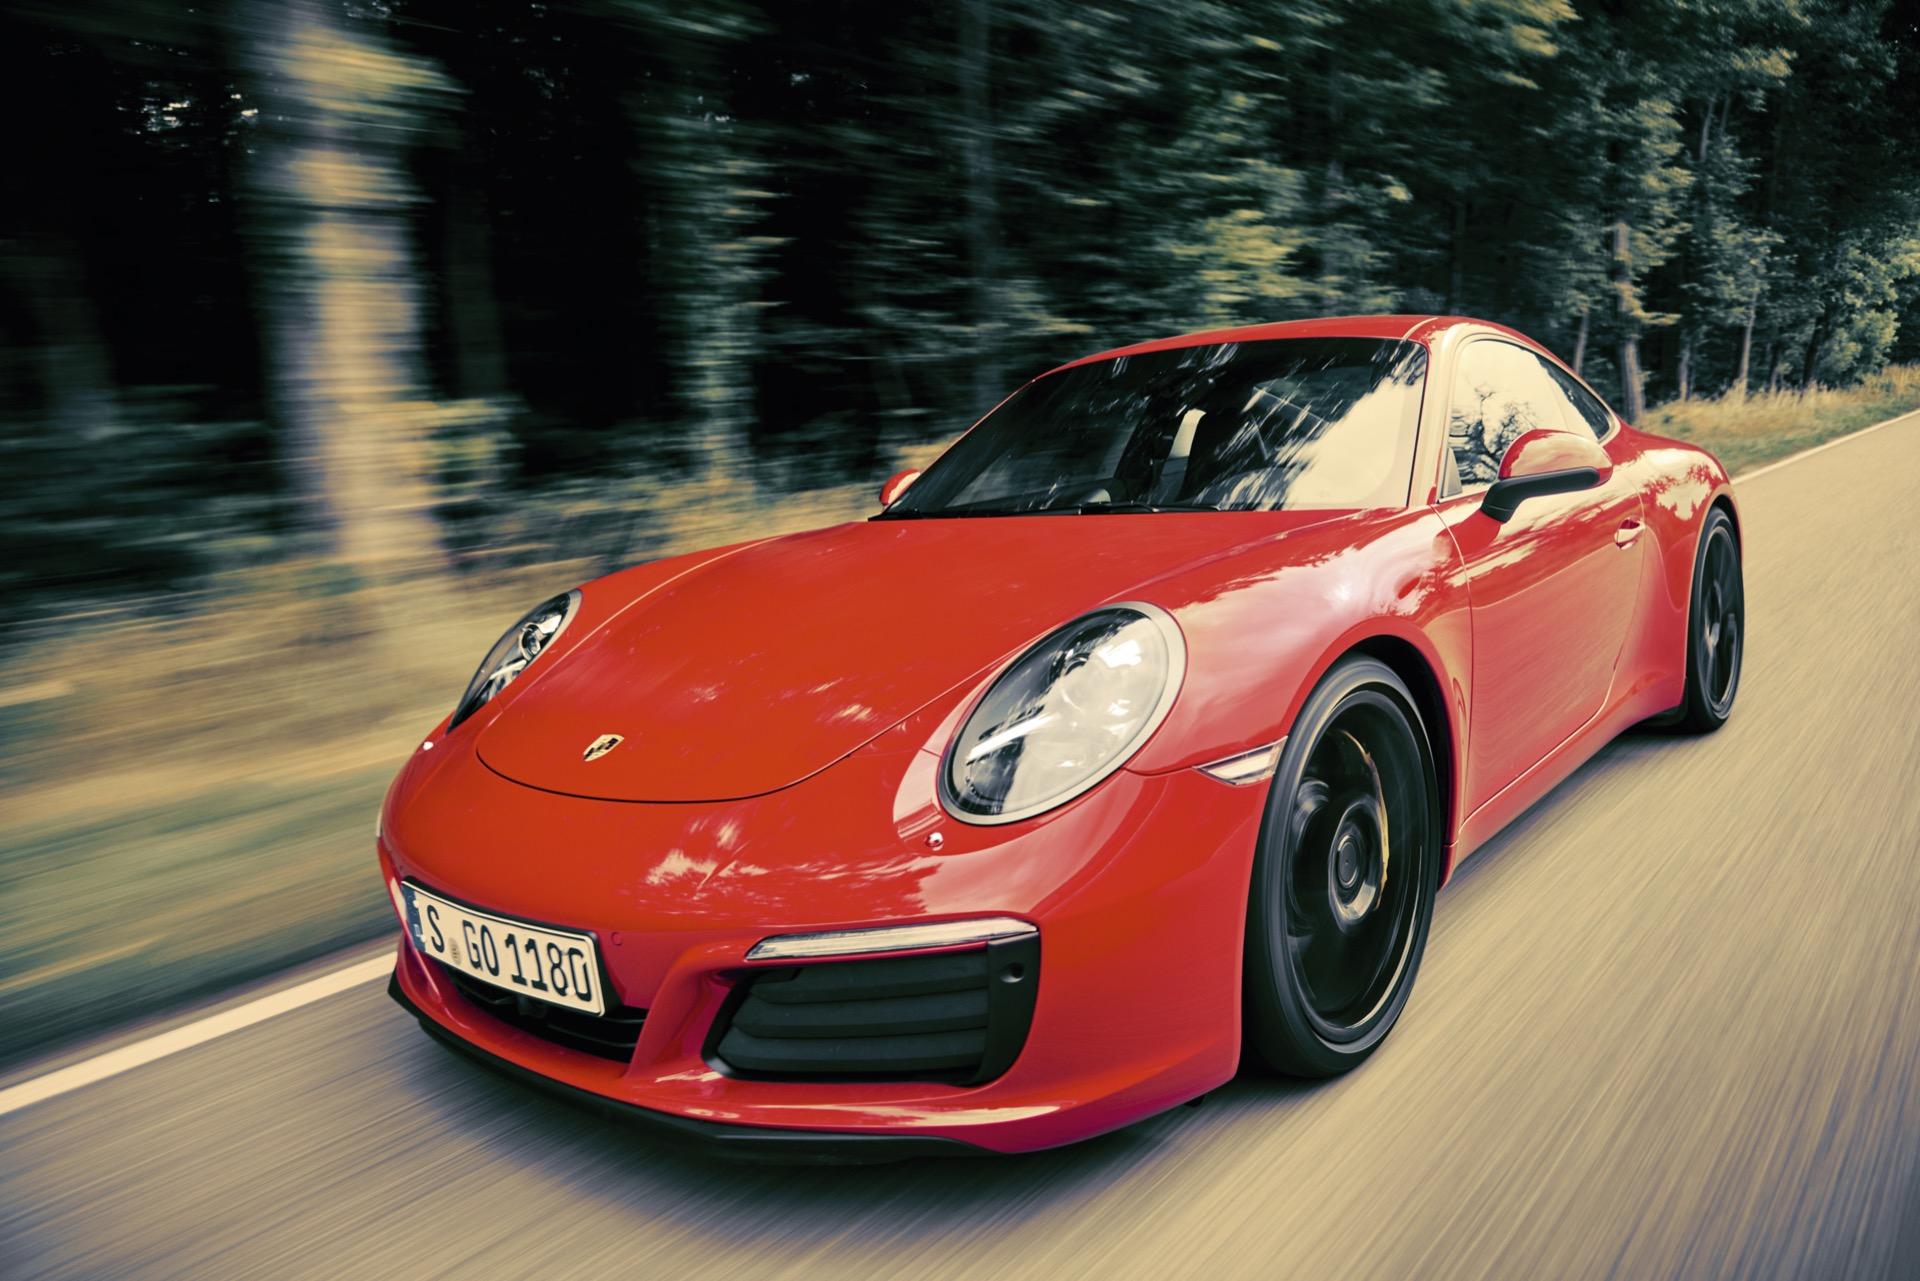 Porsche 911 991 2 Carrera S 2015